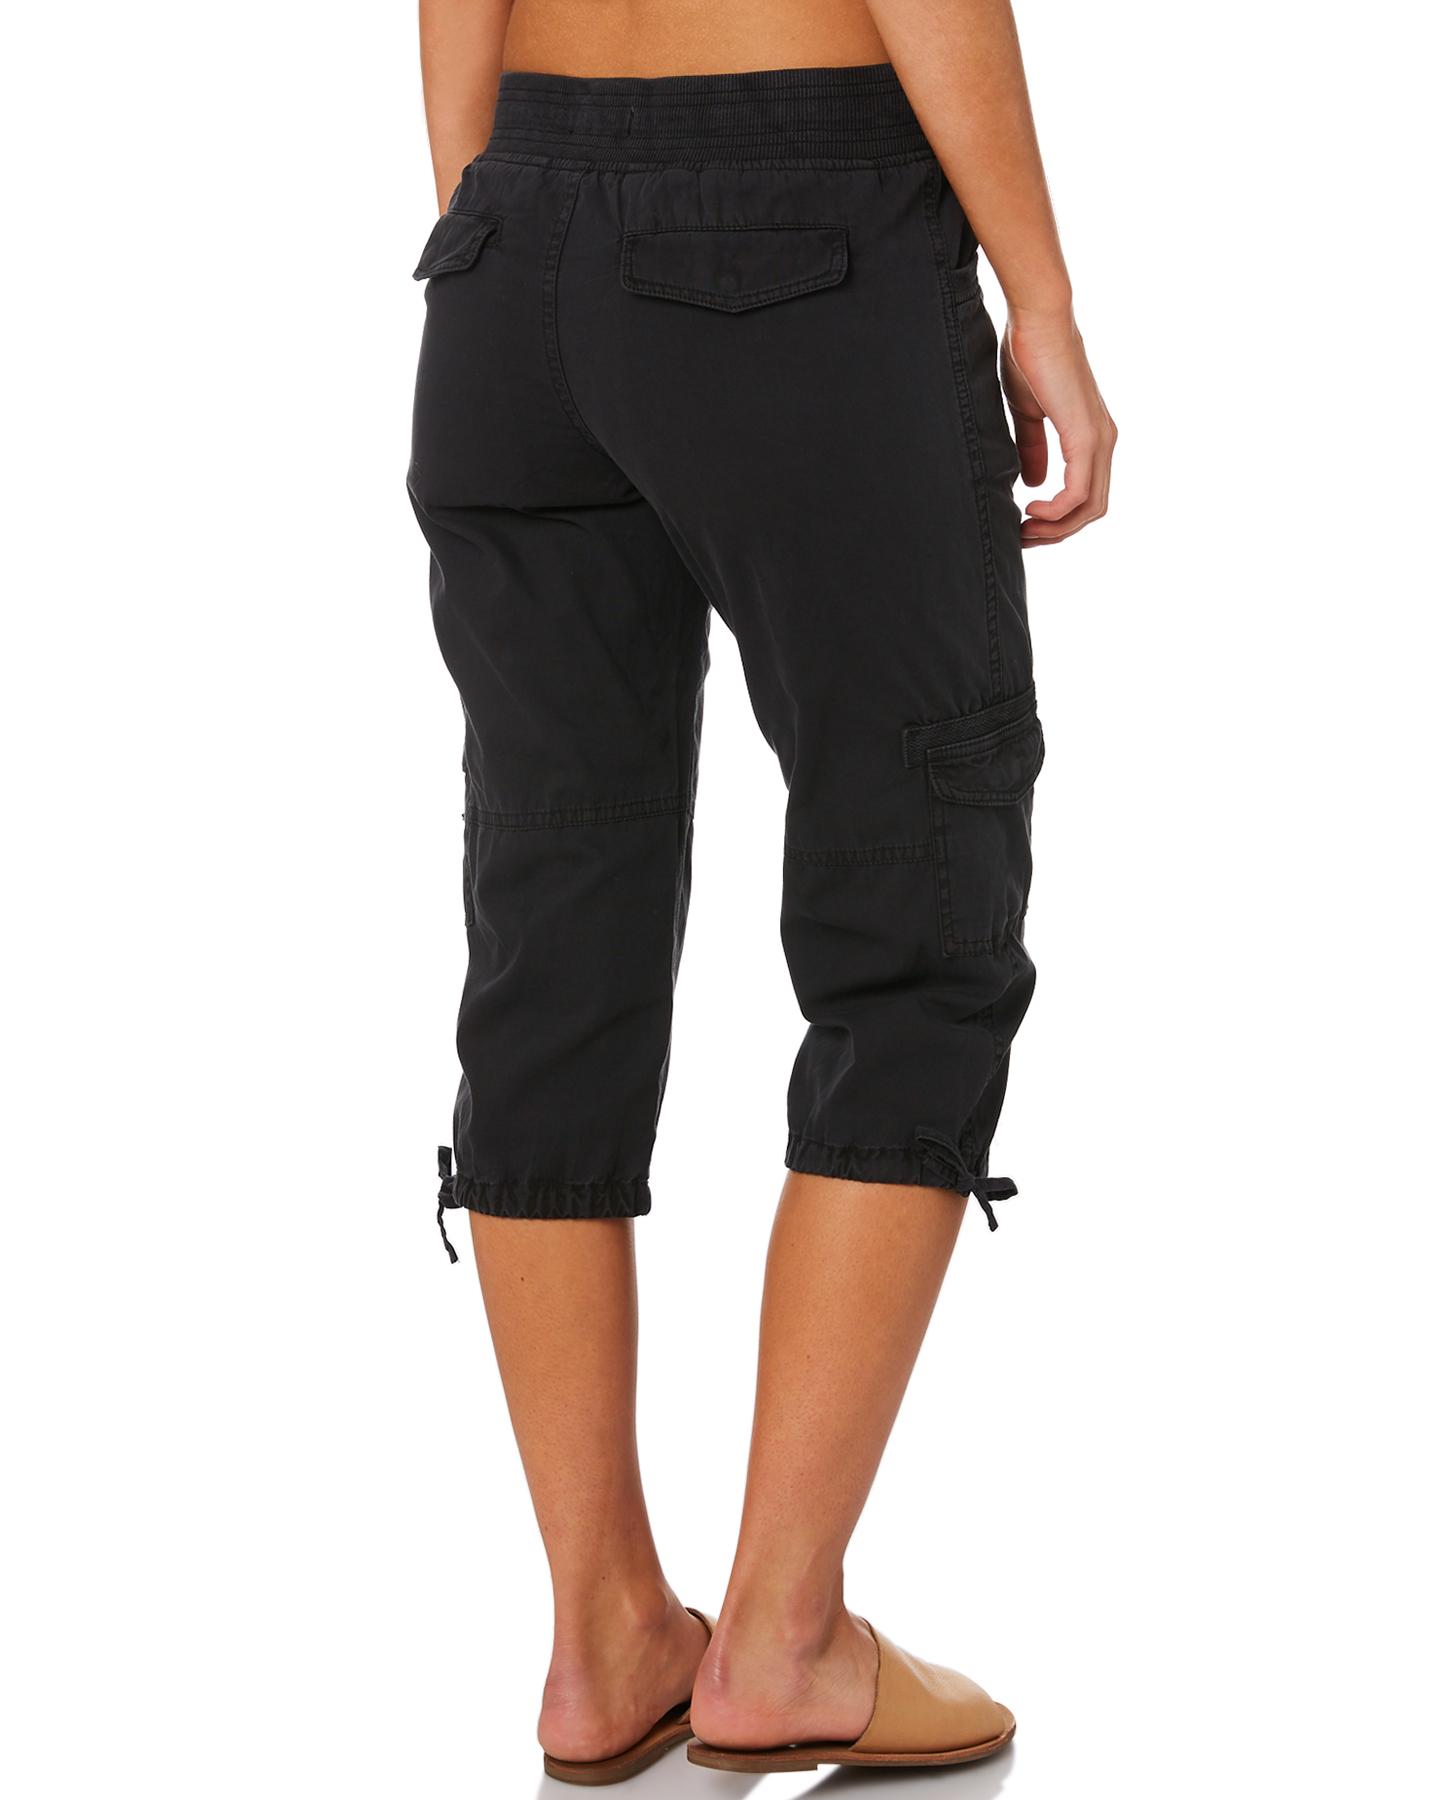 New-Swell-Women-039-s-Mayfair-3-4-Cargo-Pant-Cotton-Green thumbnail 14